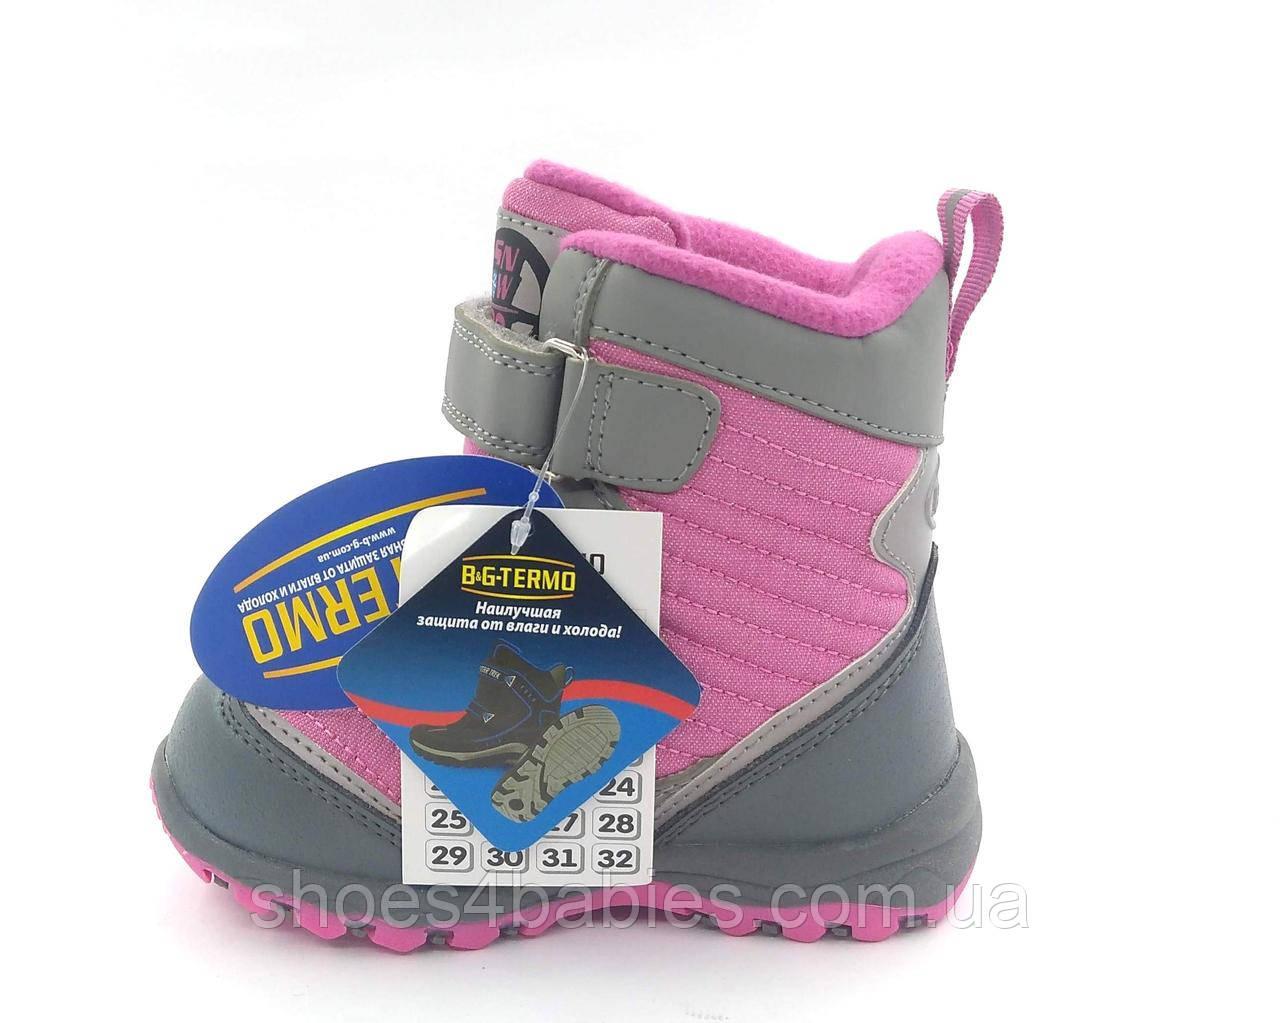 65c0deba1 Детские термо ботинки зимние B&G termo (Би Джи) р. 23-27 модель 197-901,  цена 850 грн., купить в Киеве — Prom.ua (ID#787975340)